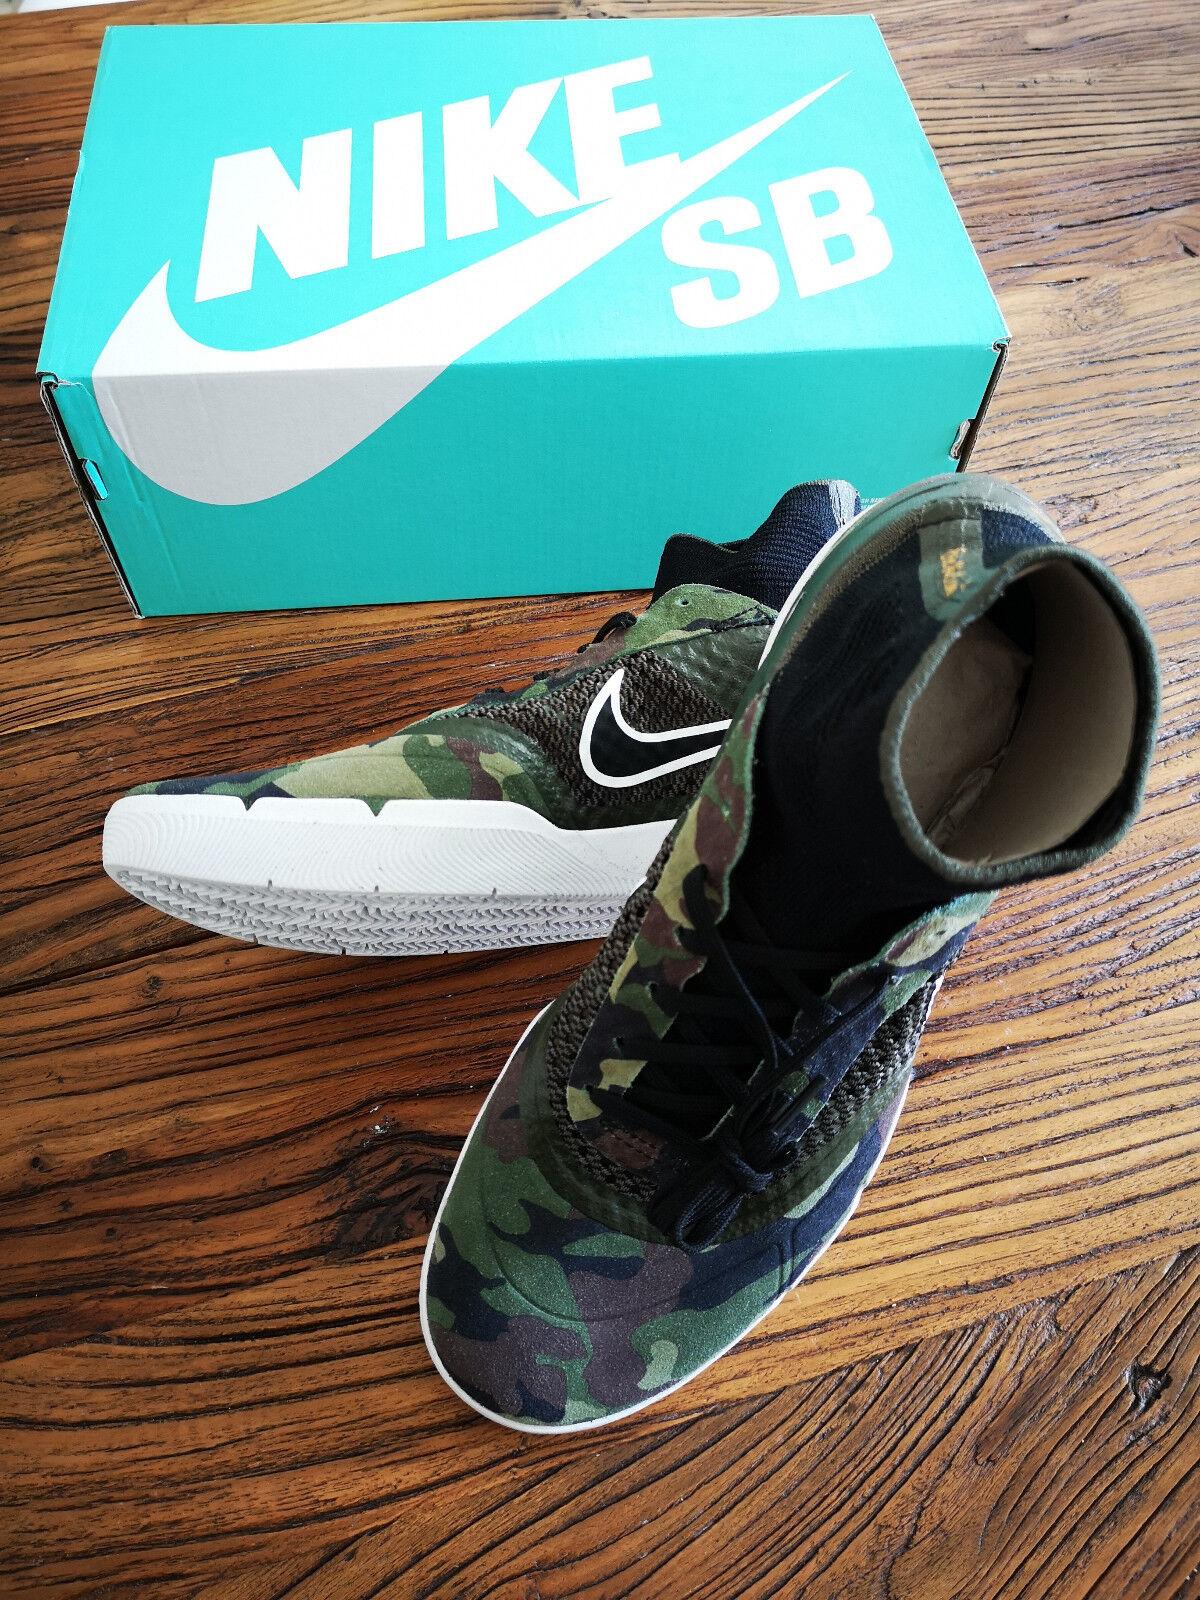 Nike SB camouflage EUR 44,5 US 10,5 neu selten